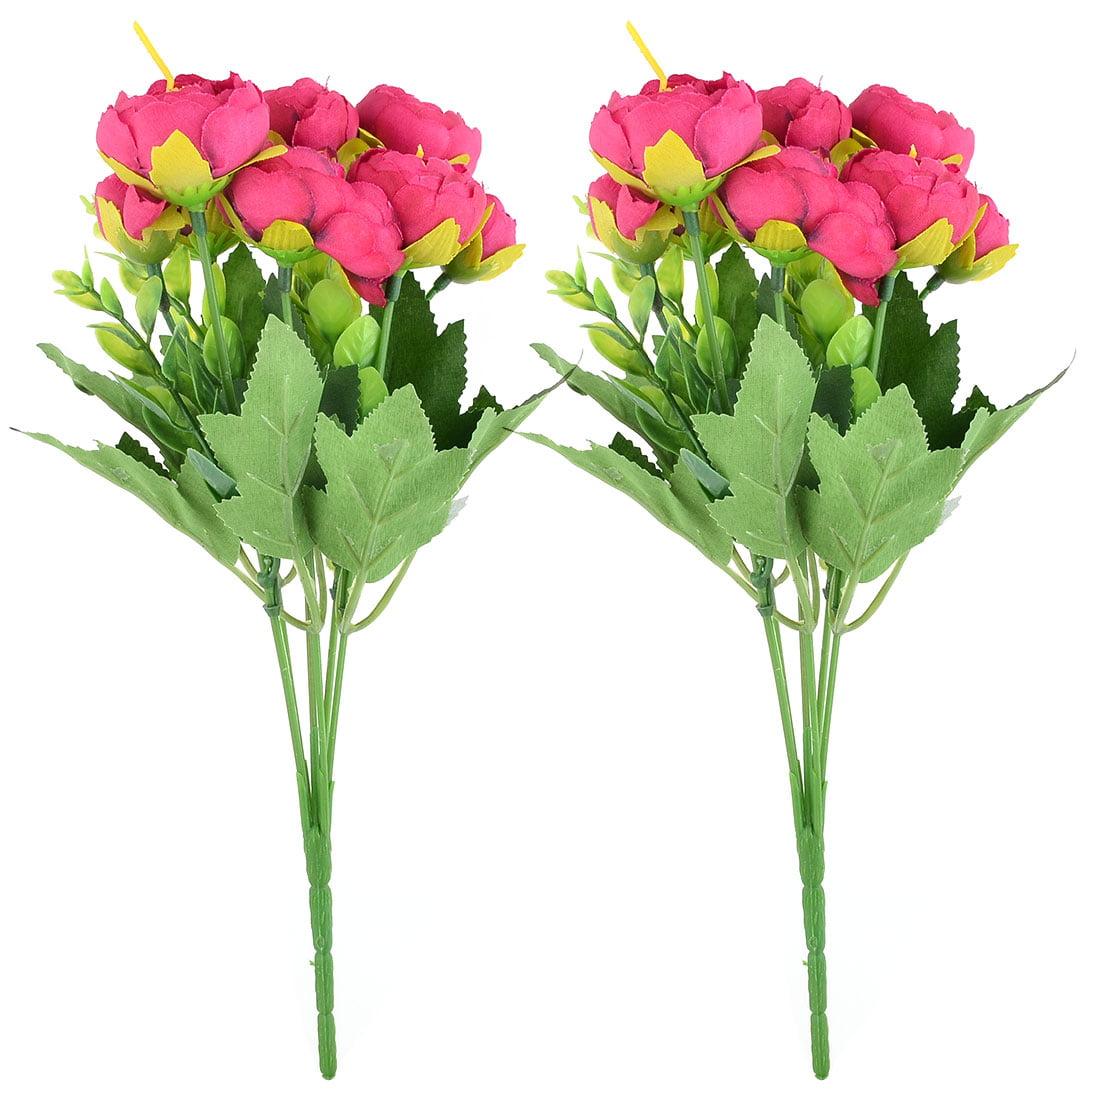 Wedding Fabric Camellia Shaped DIY Craft Artificial Flower Bouquet Fuchsia 2pcs